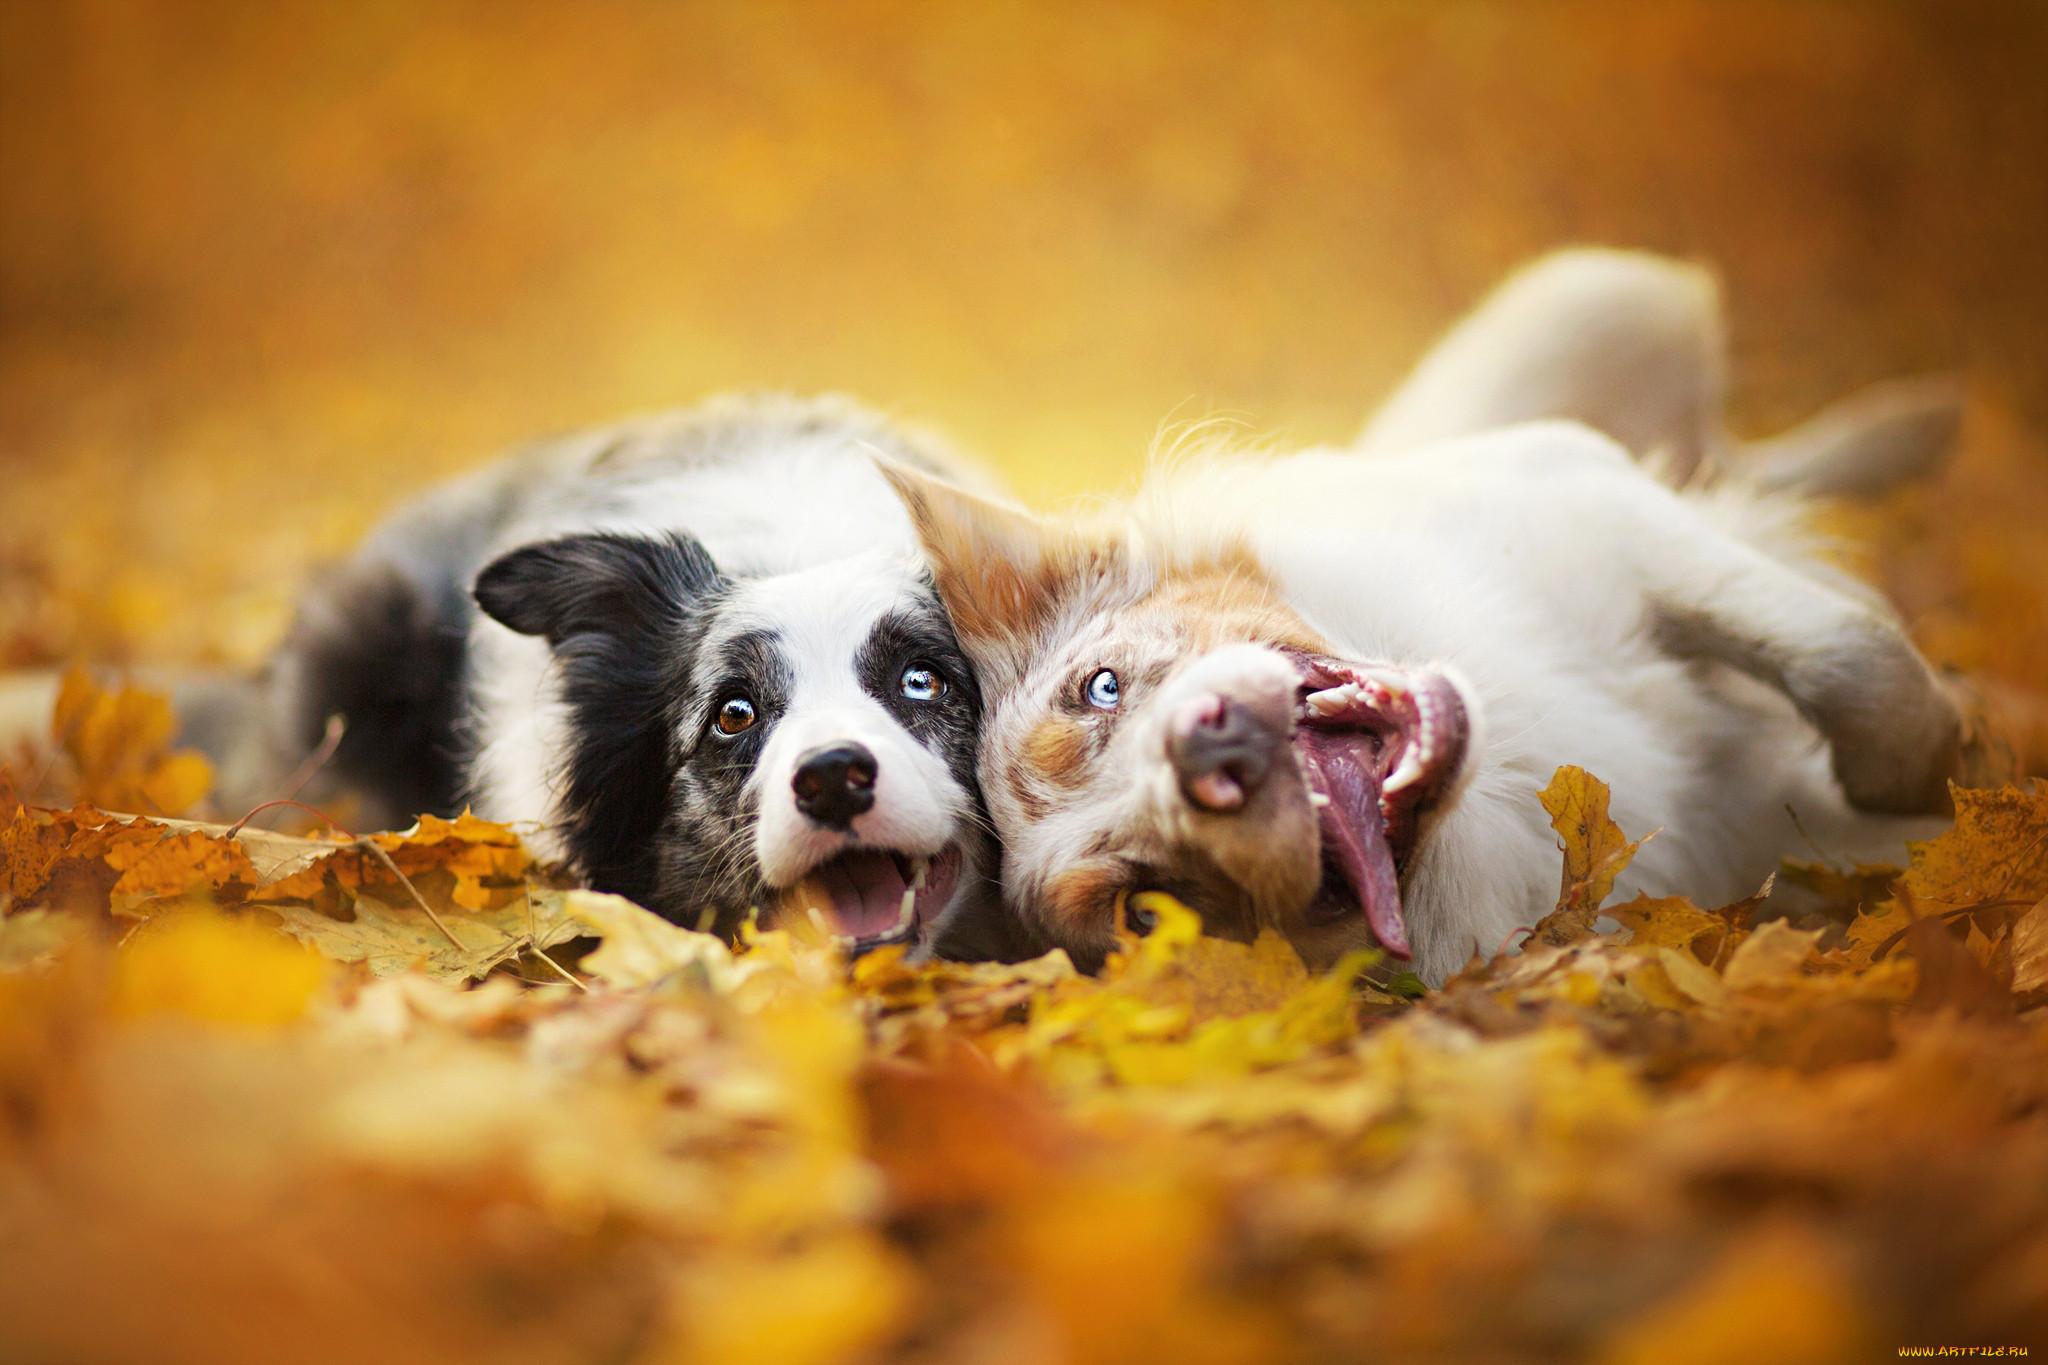 разделе картинка осенняя улыбка собаки важно, тепло